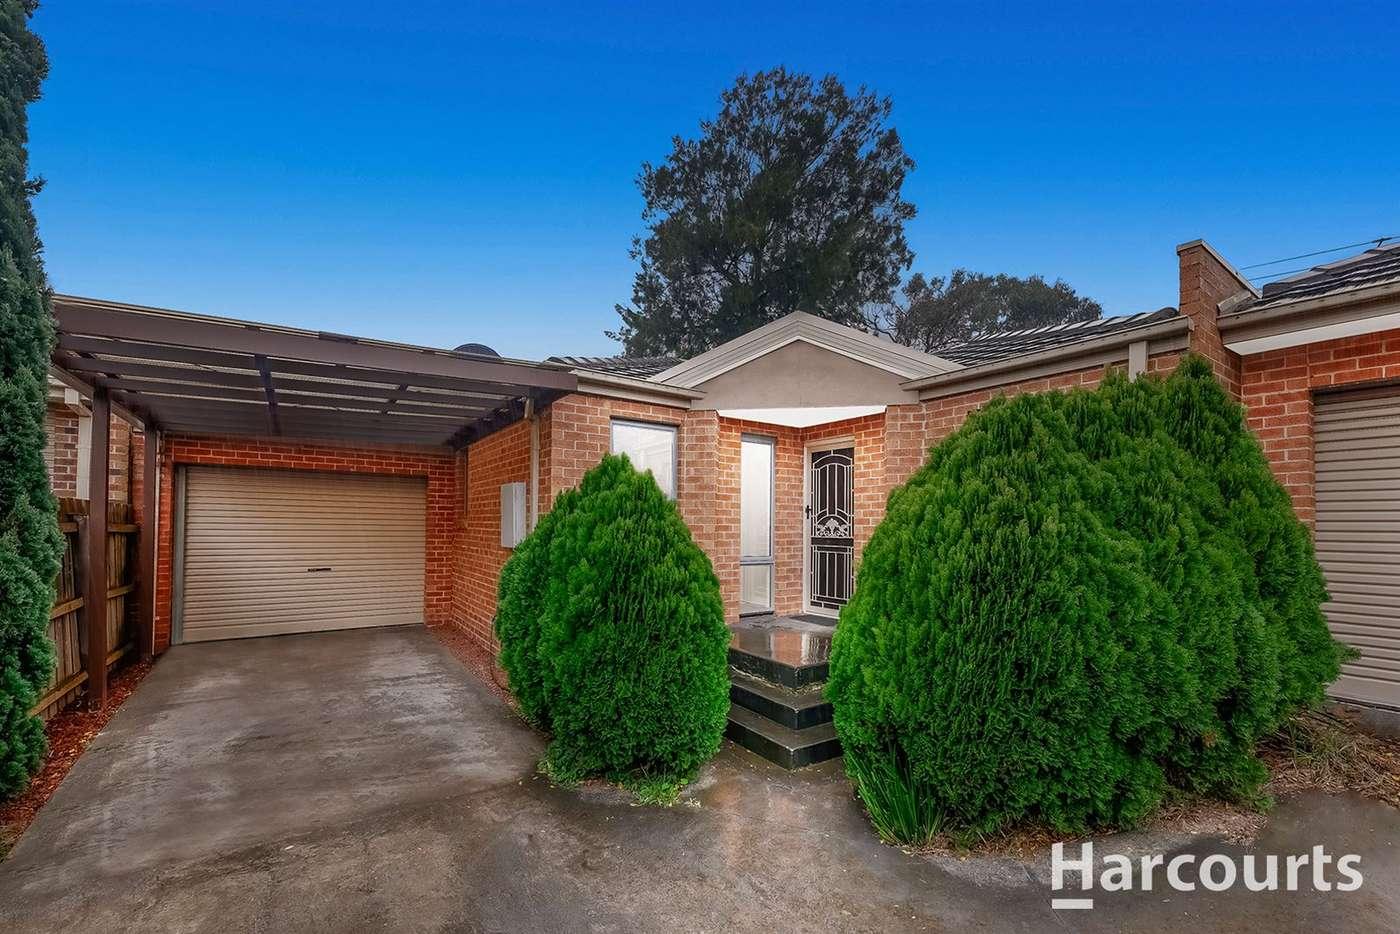 Main view of Homely unit listing, 2/11 Melaleuca Drive, Glen Waverley VIC 3150